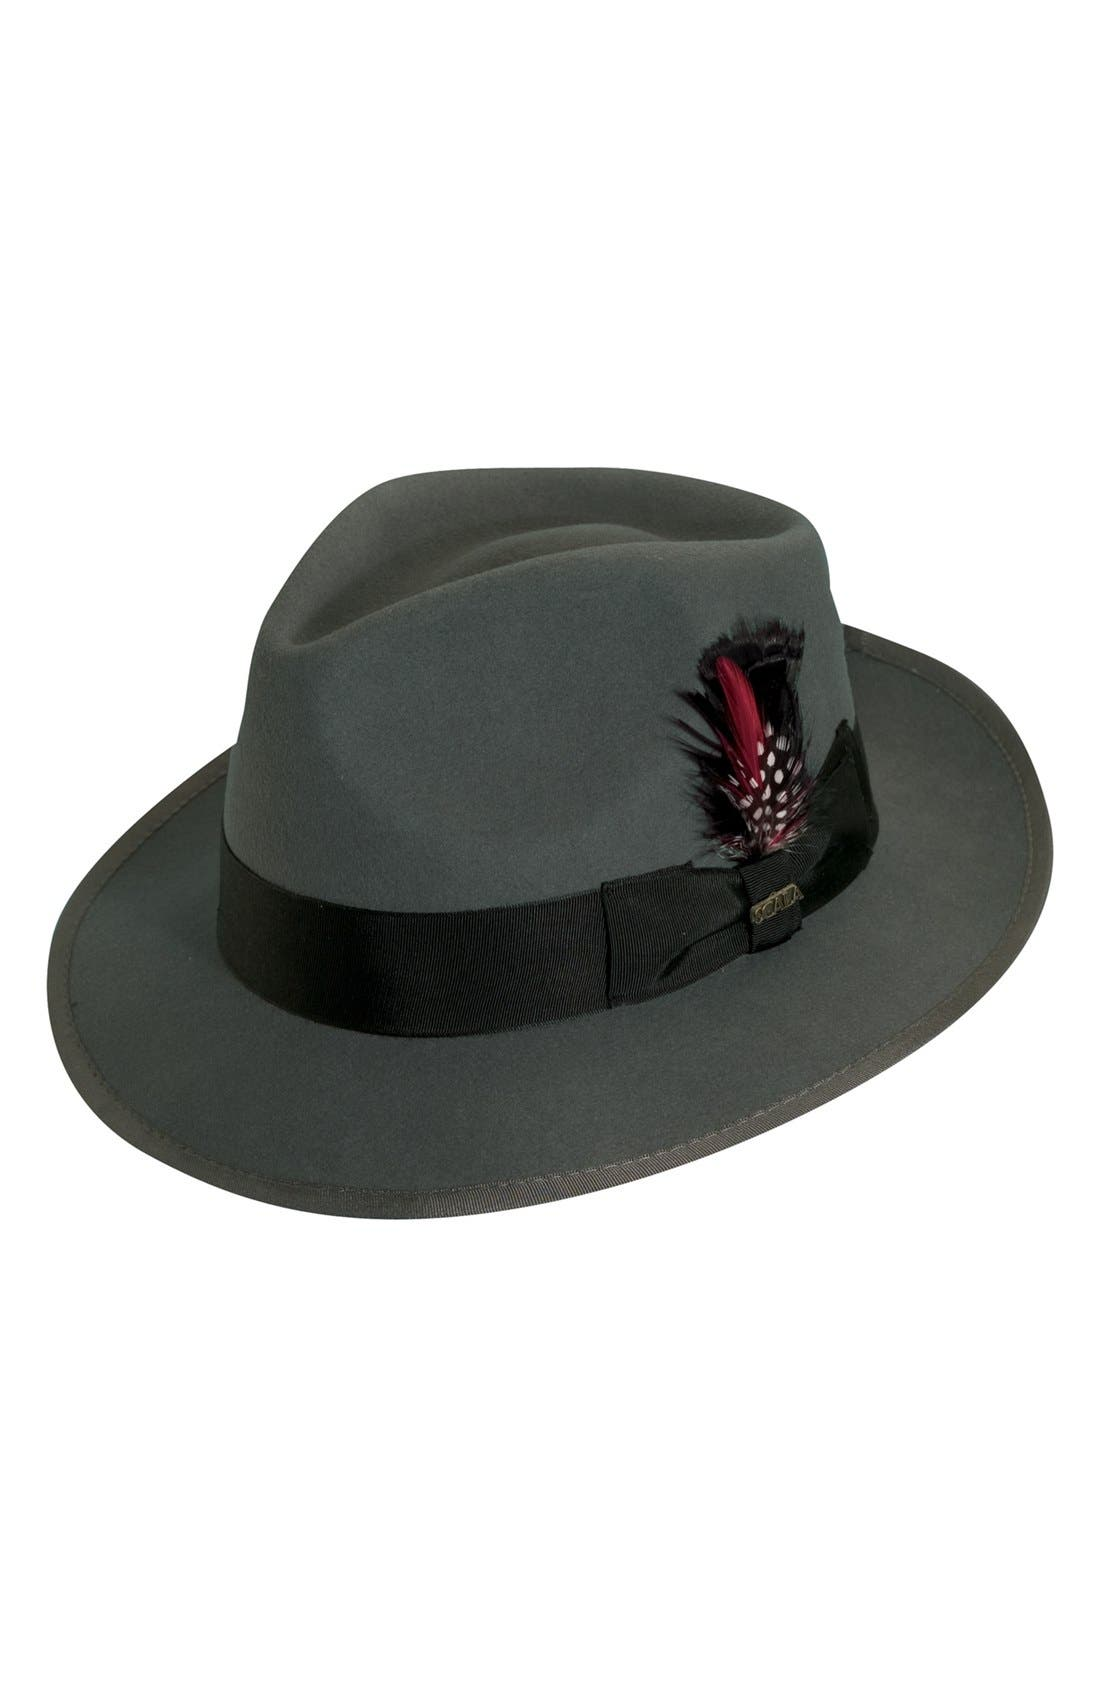 'Classico' Wool Felt Snap Brim Hat,                             Main thumbnail 1, color,                             GREY